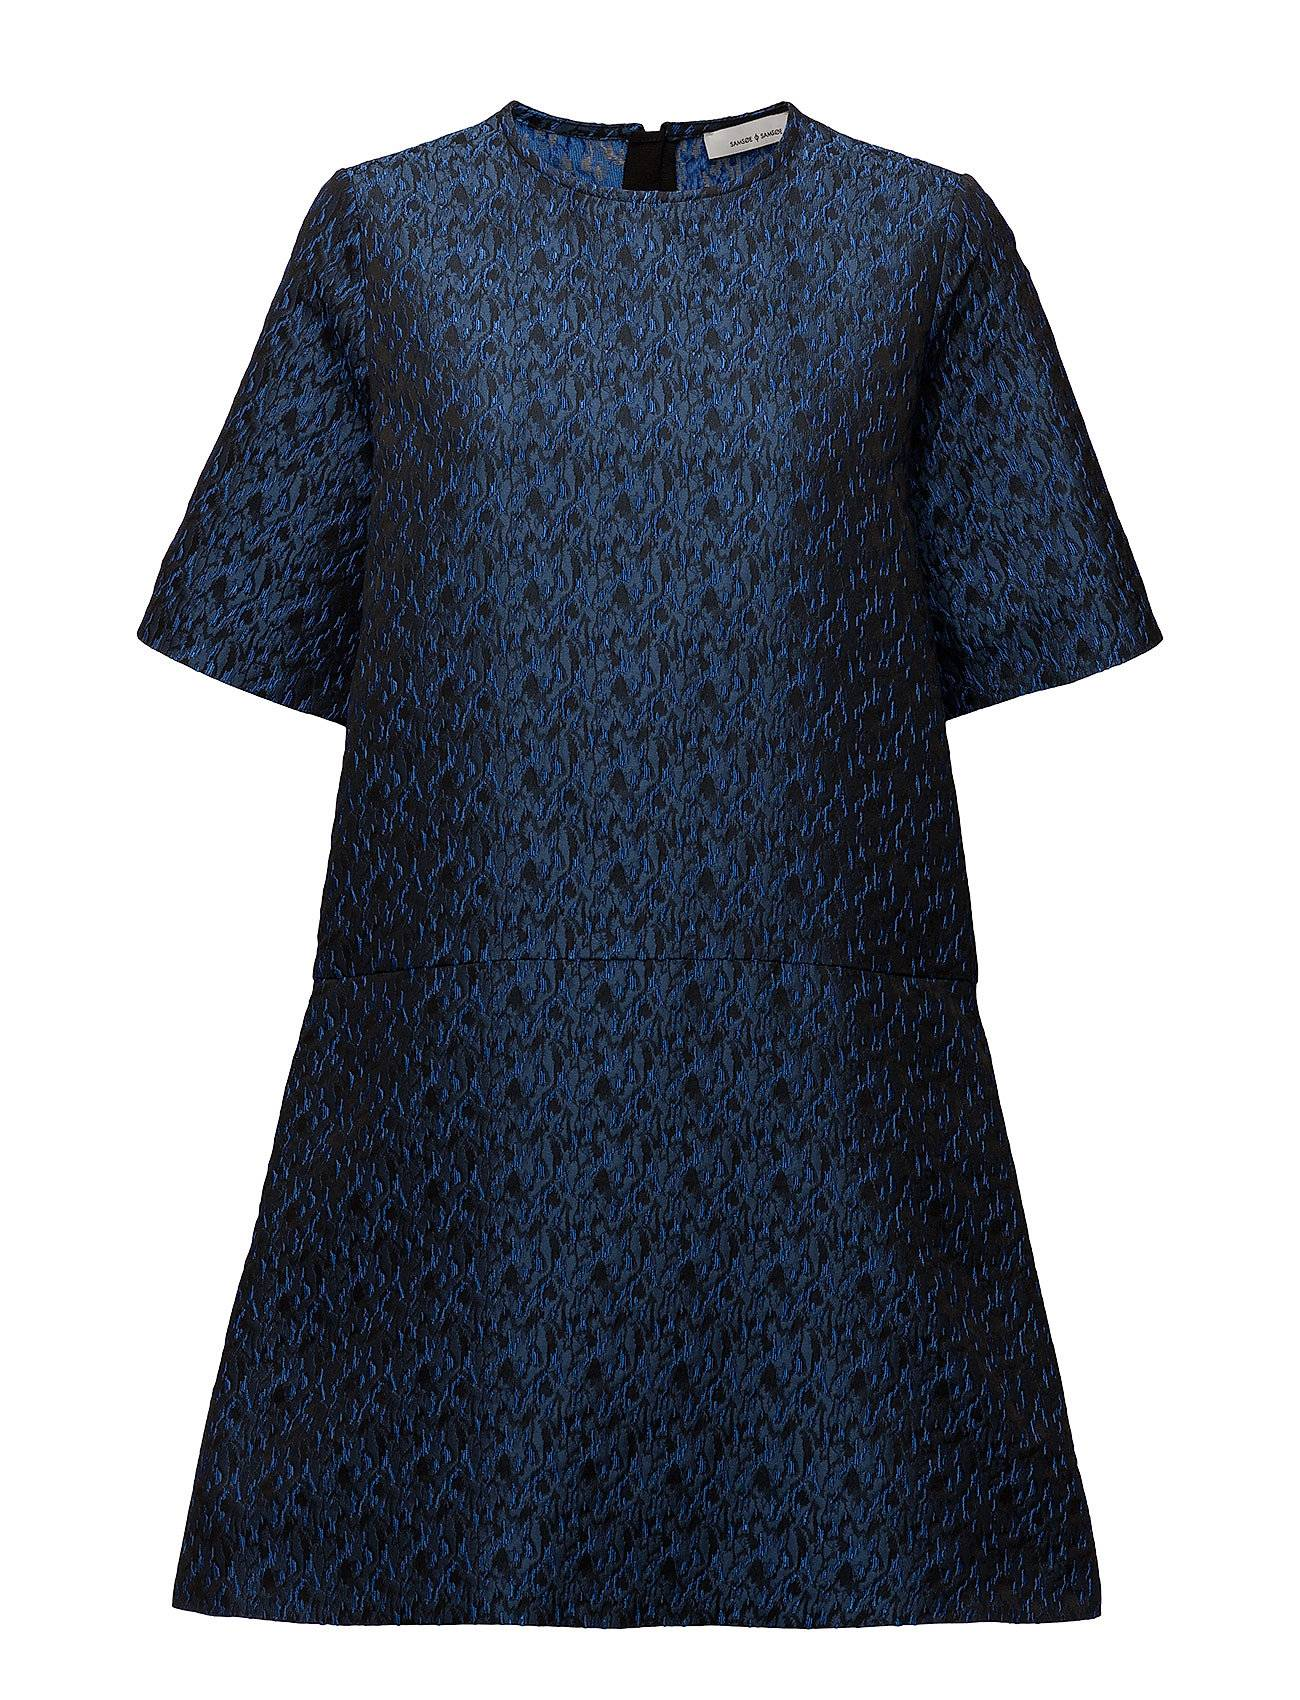 Samsøe & Samsøe Adelaide Dress 10159